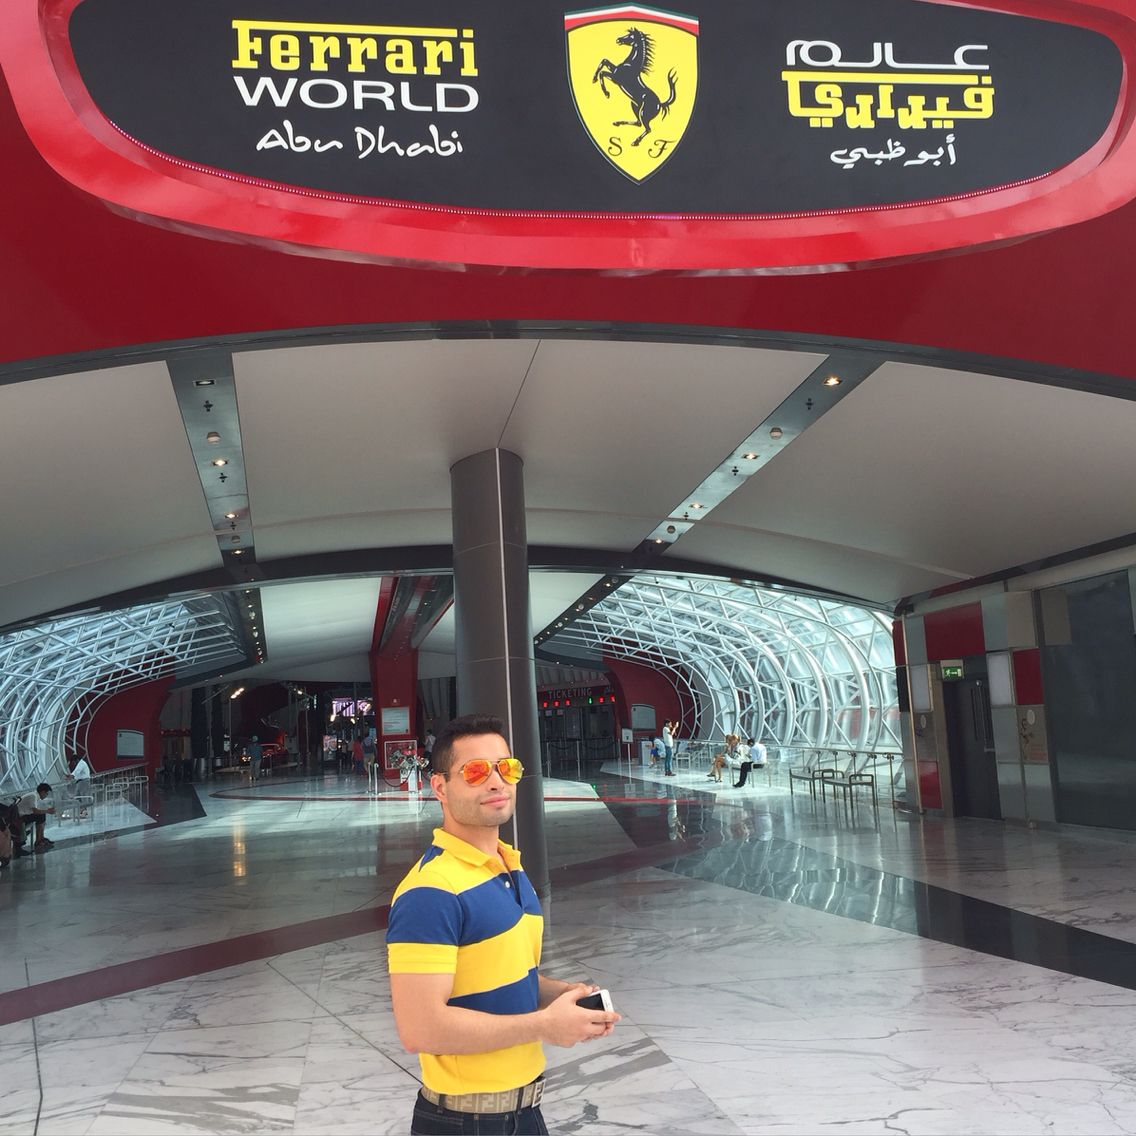 Ferrari World Abu Dhabi #Quote #Humour #Holiday